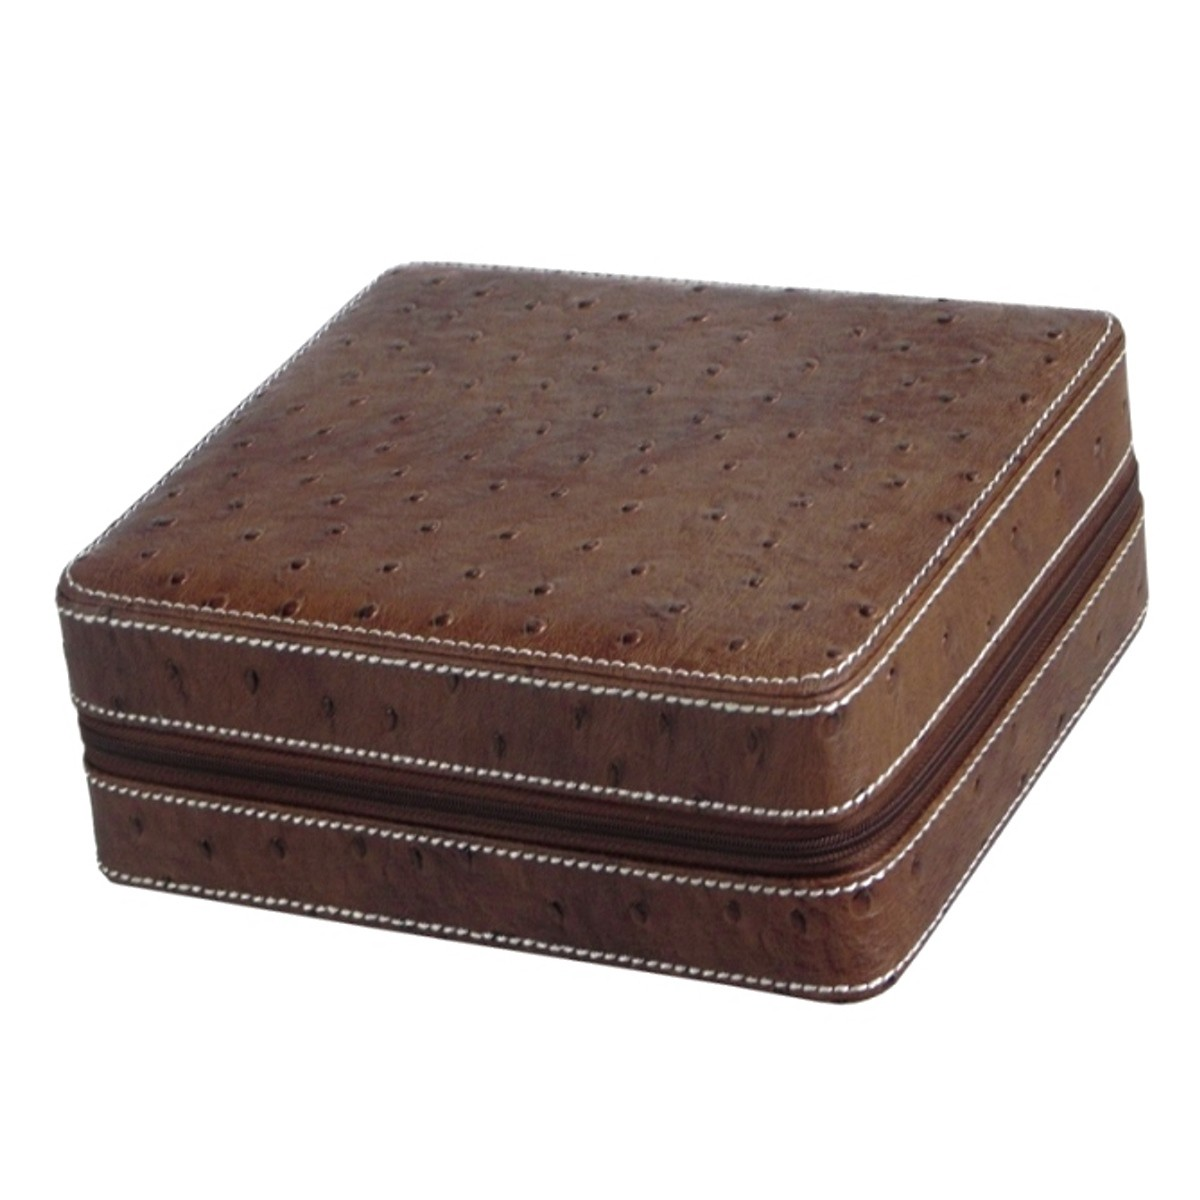 Uhrenetui Traveler Diplomat 4 Von BullongÈ Boxes, Cases & Watch Winders